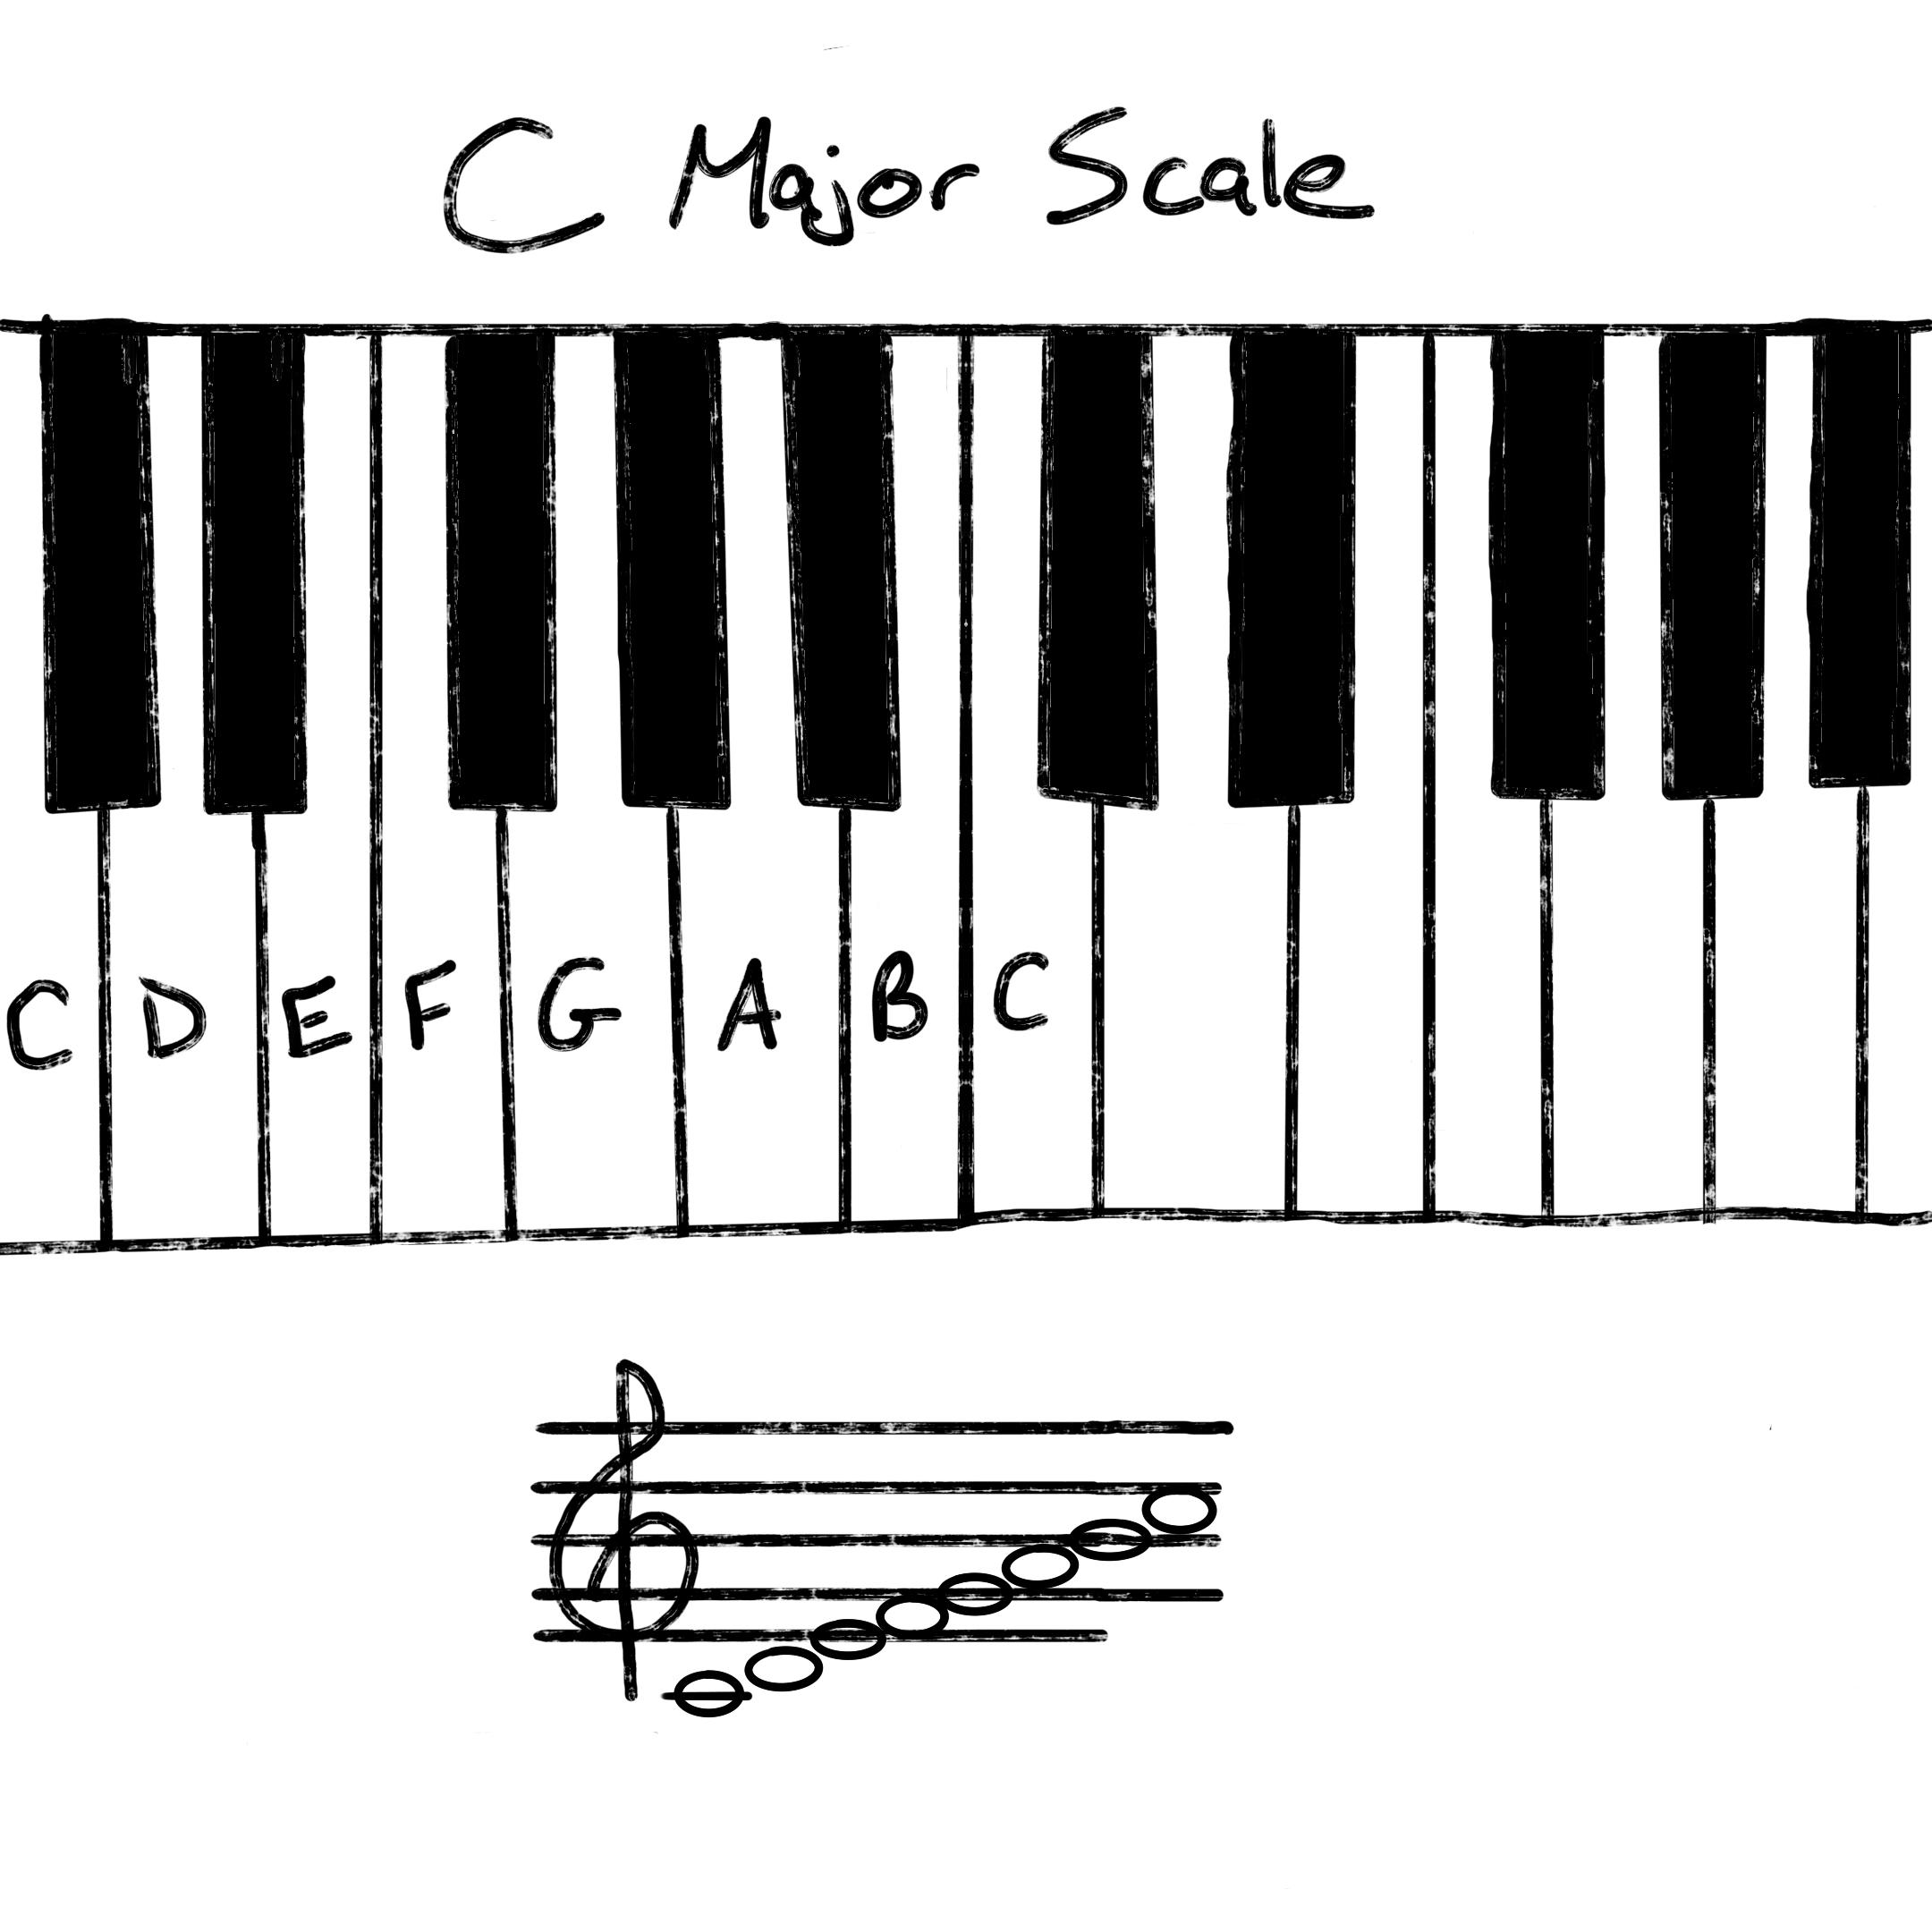 c major scale on keyboard